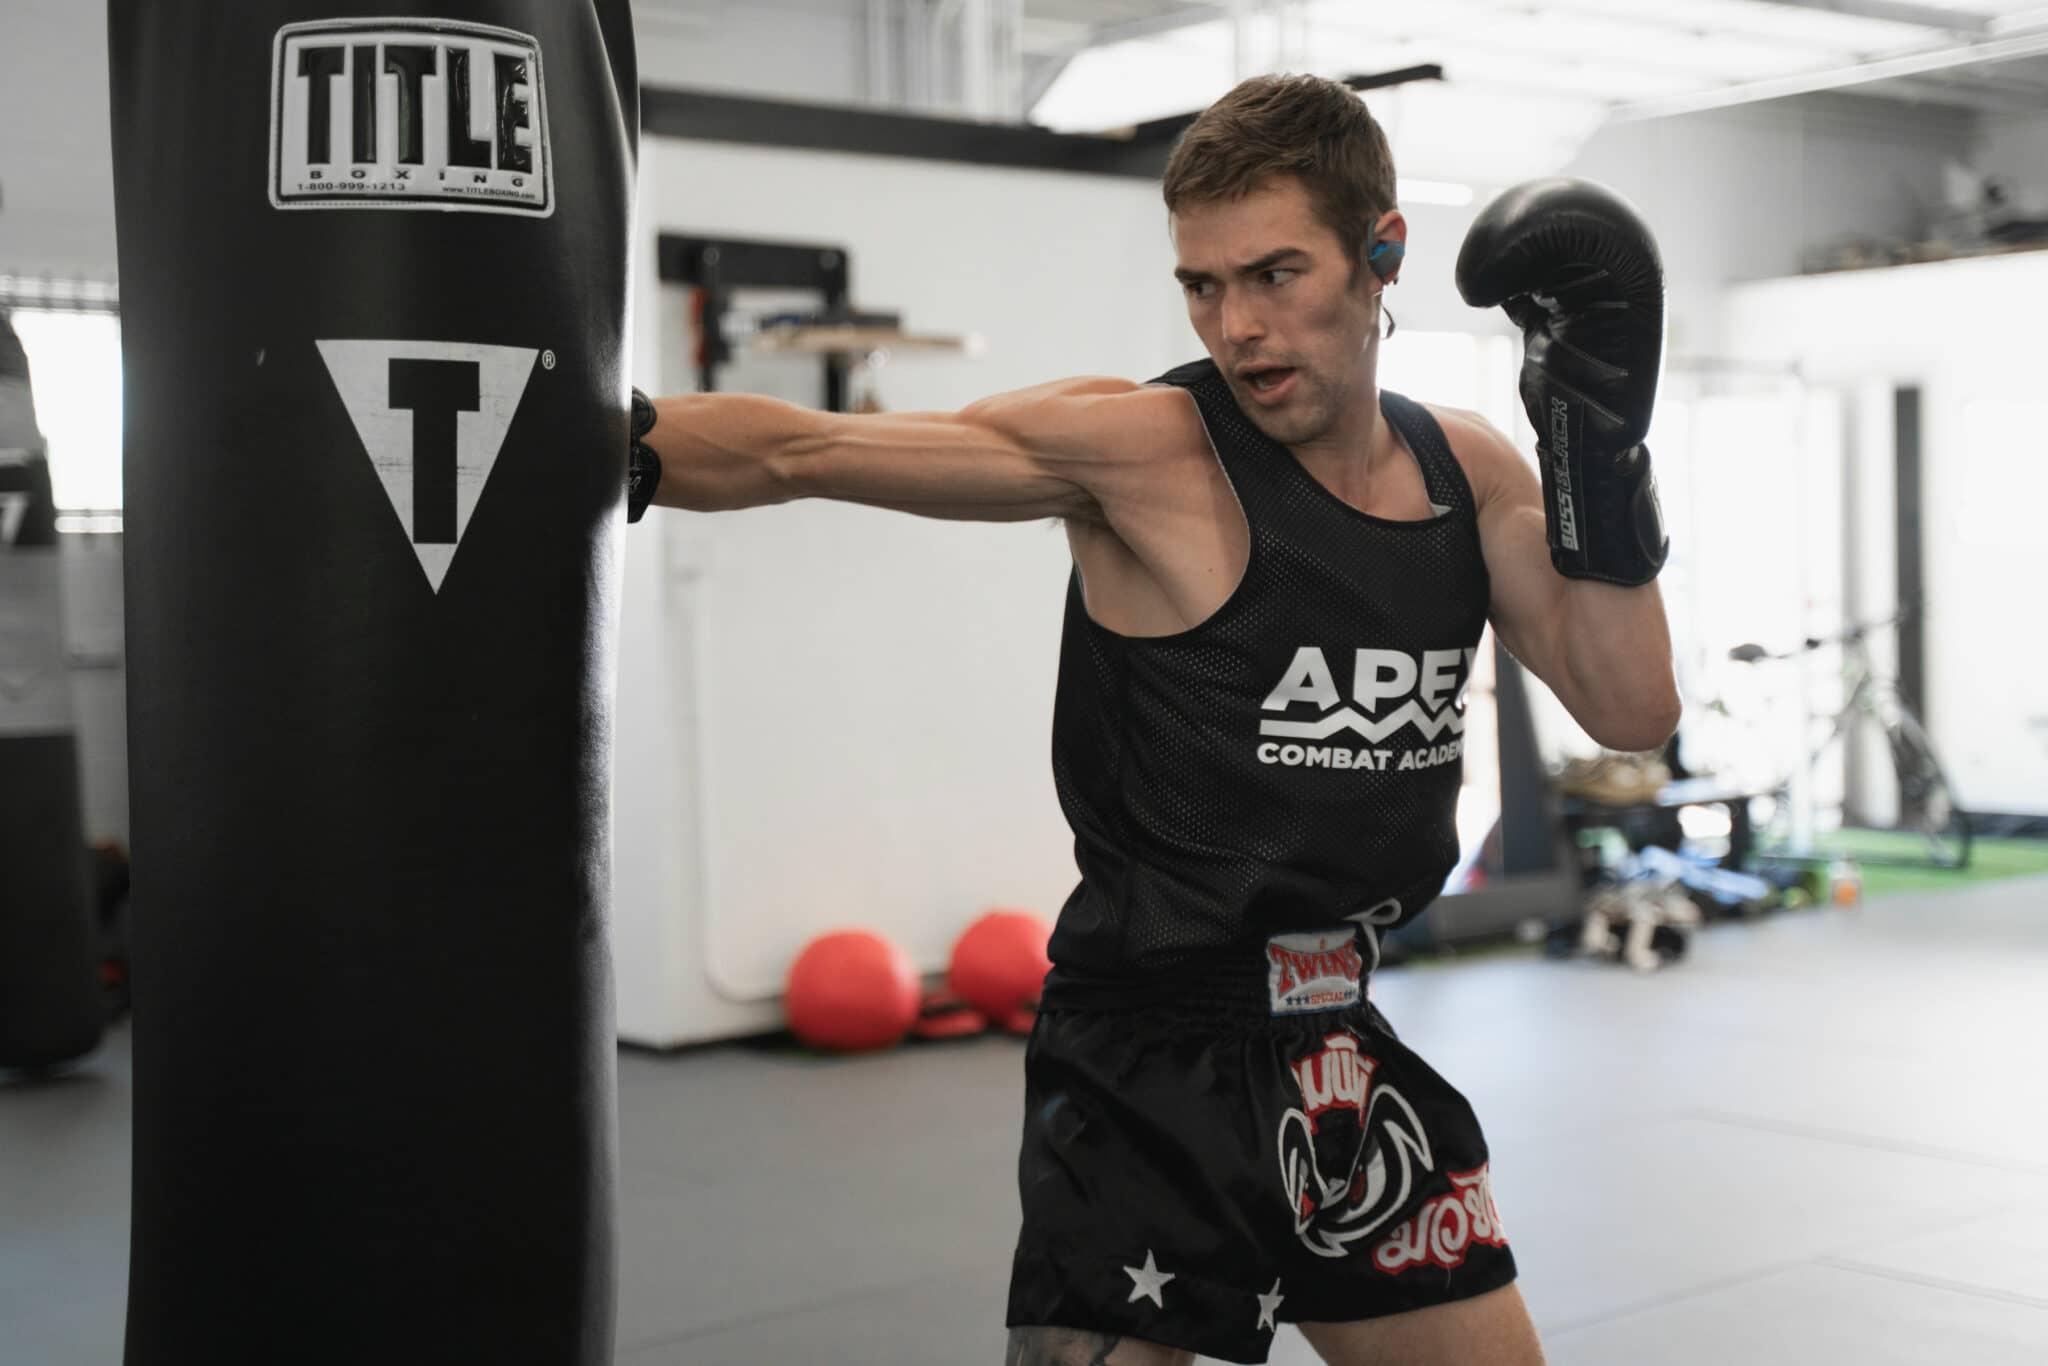 Apex Combat Academy Advanced Muay Thai Kickboxing